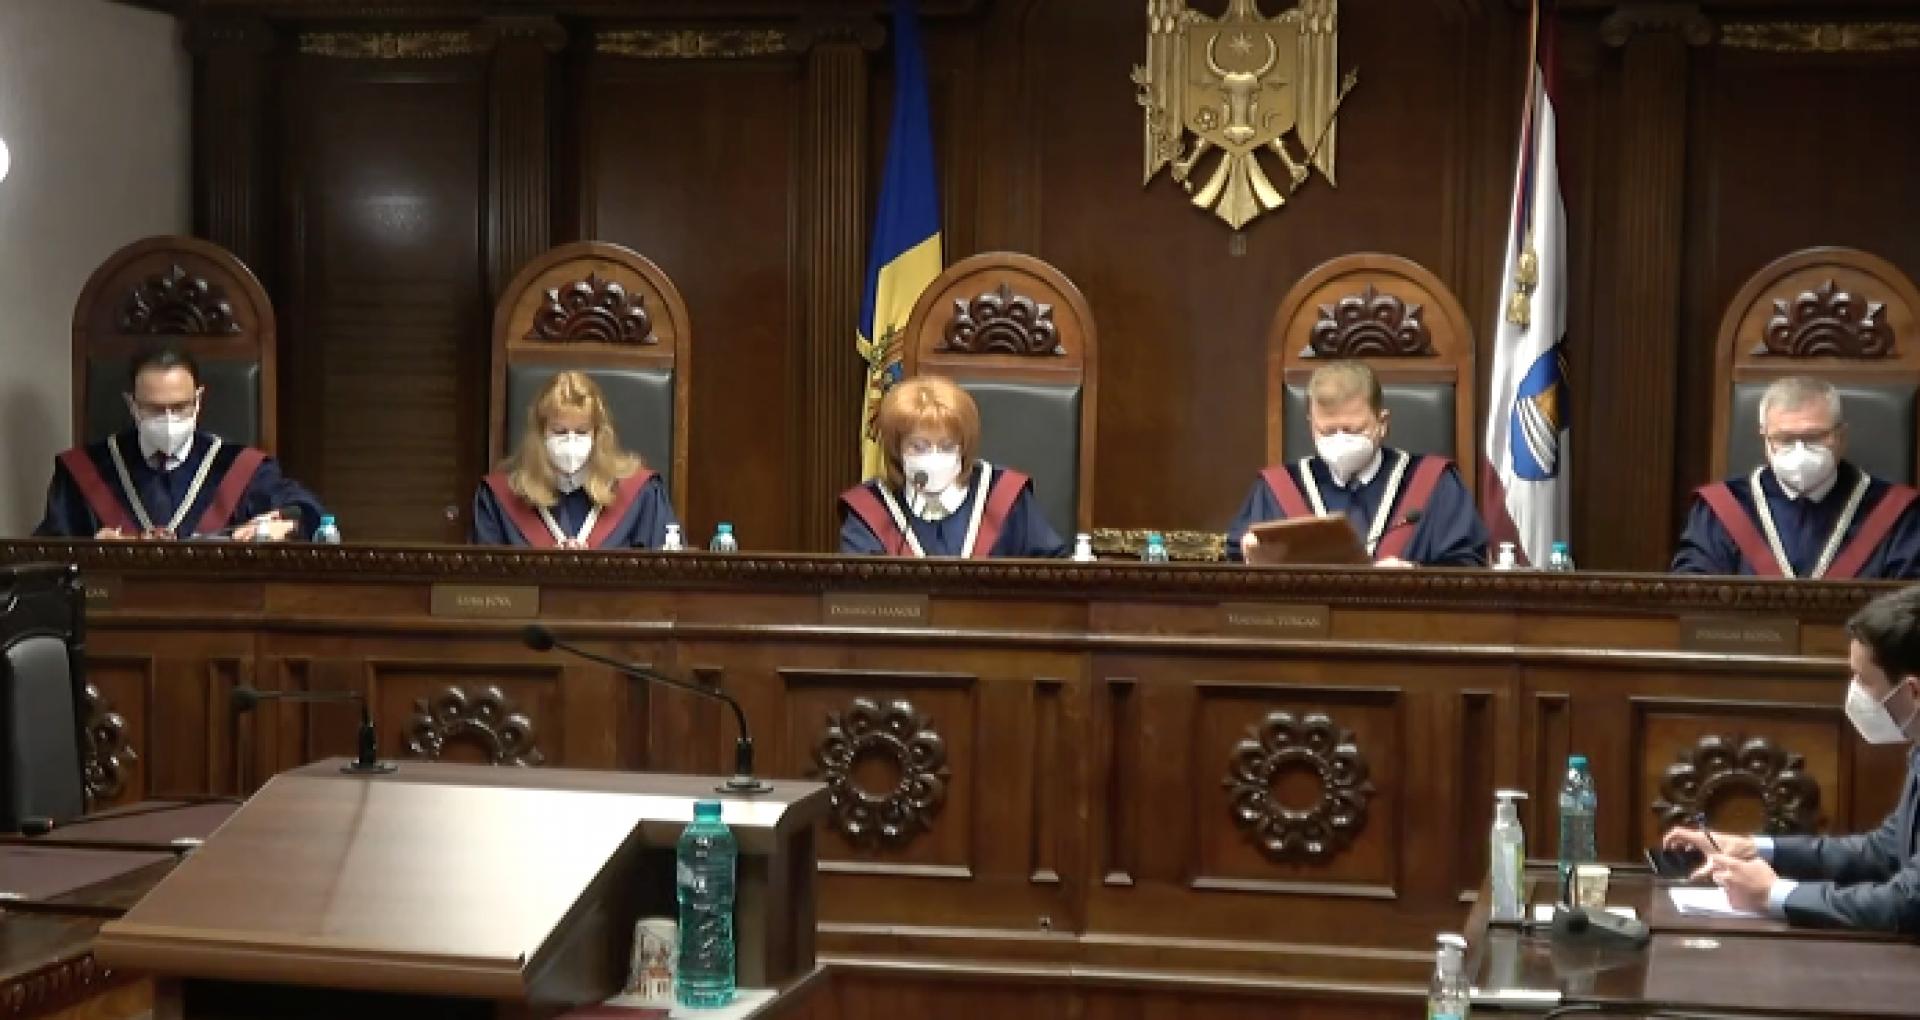 Constitutional Court Declares Unconstitutional Parliament's Decision to Revoke the Court's Judge